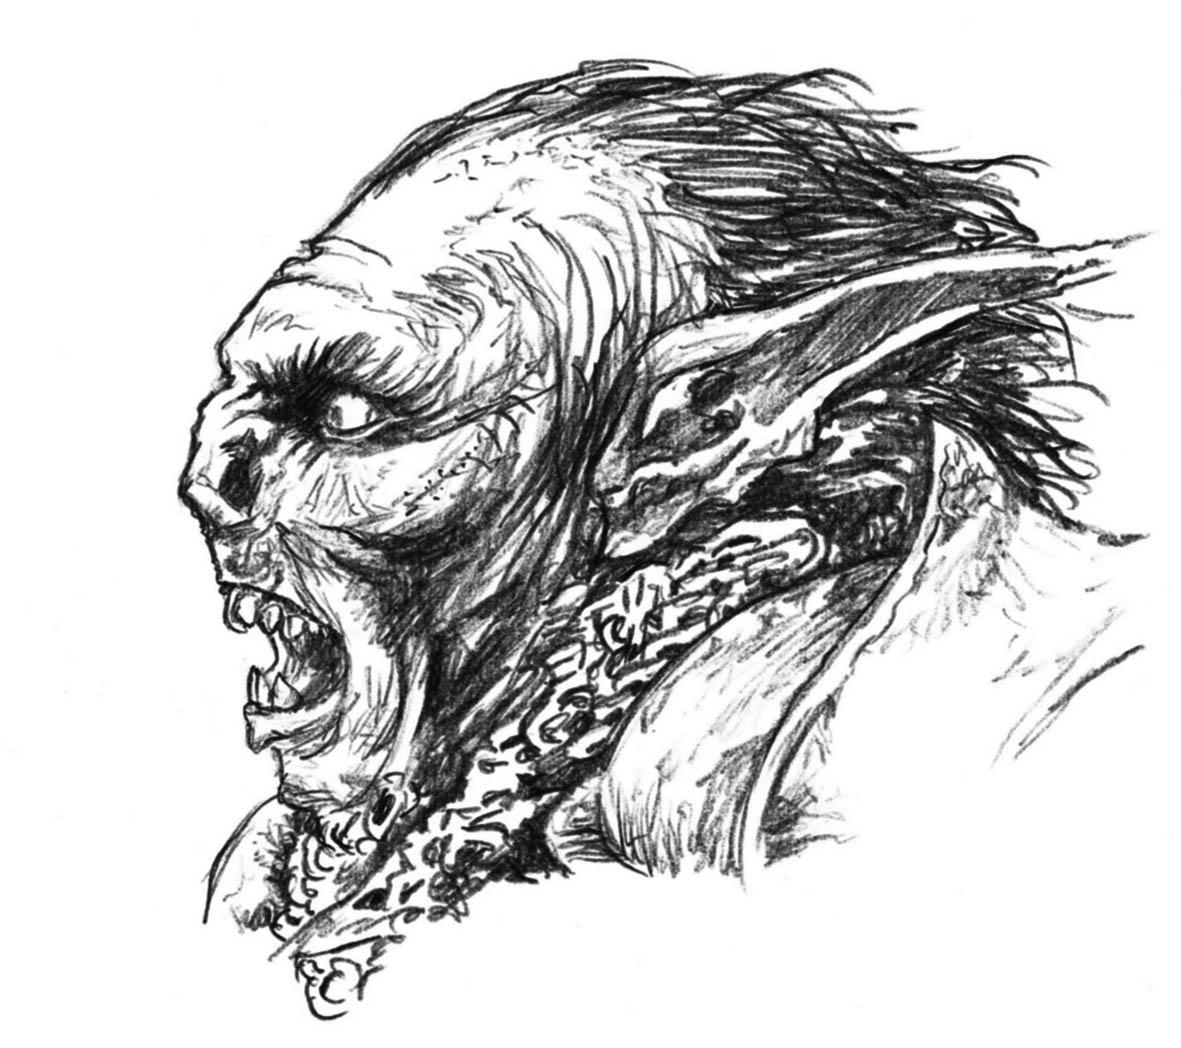 Lord of the rings sketches   Jorge Madejon Portfolio